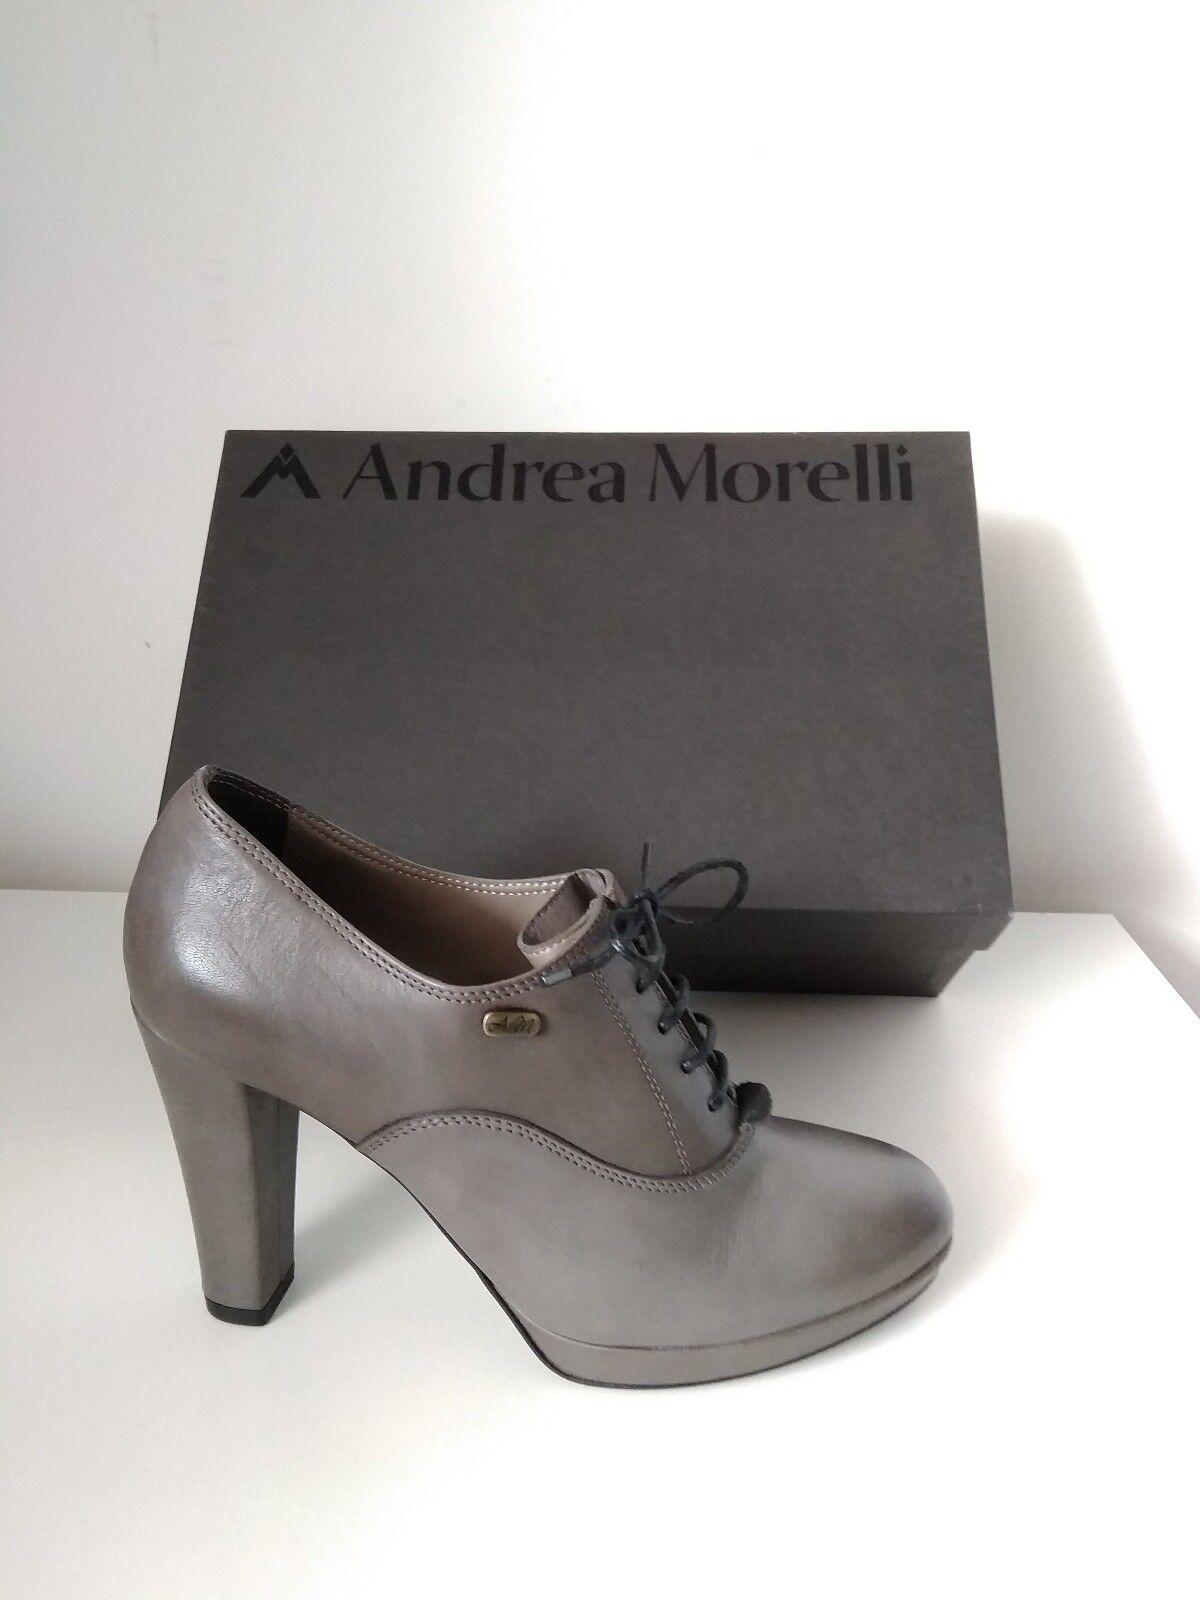 Scarpe francesine Andrea Morelli cenere n.37 tacco 95 mm